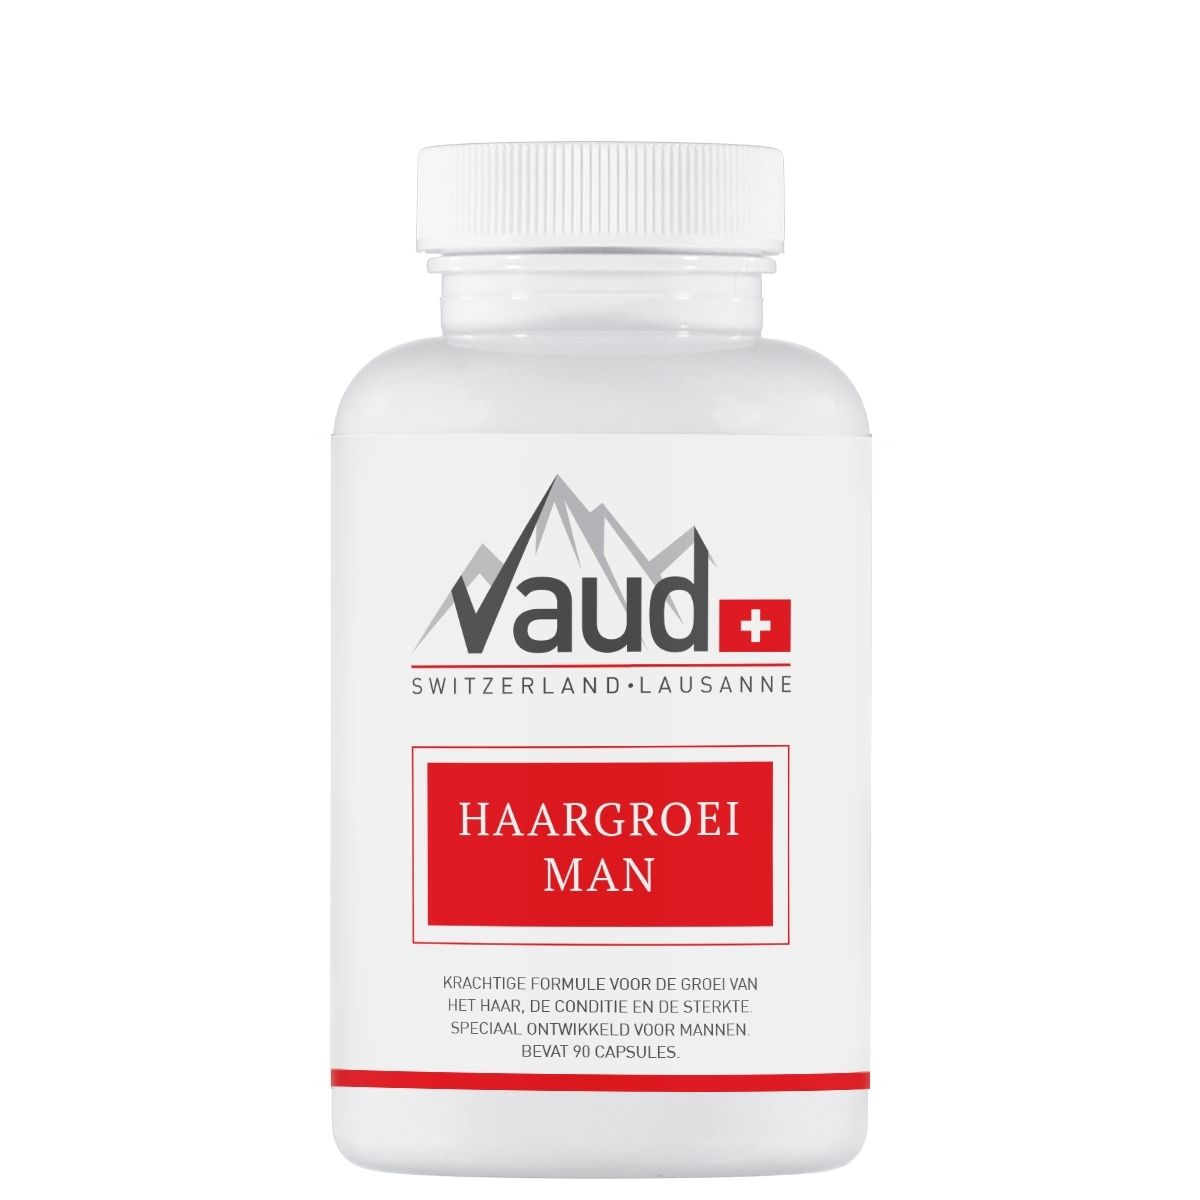 Haargroei Man - Vaud